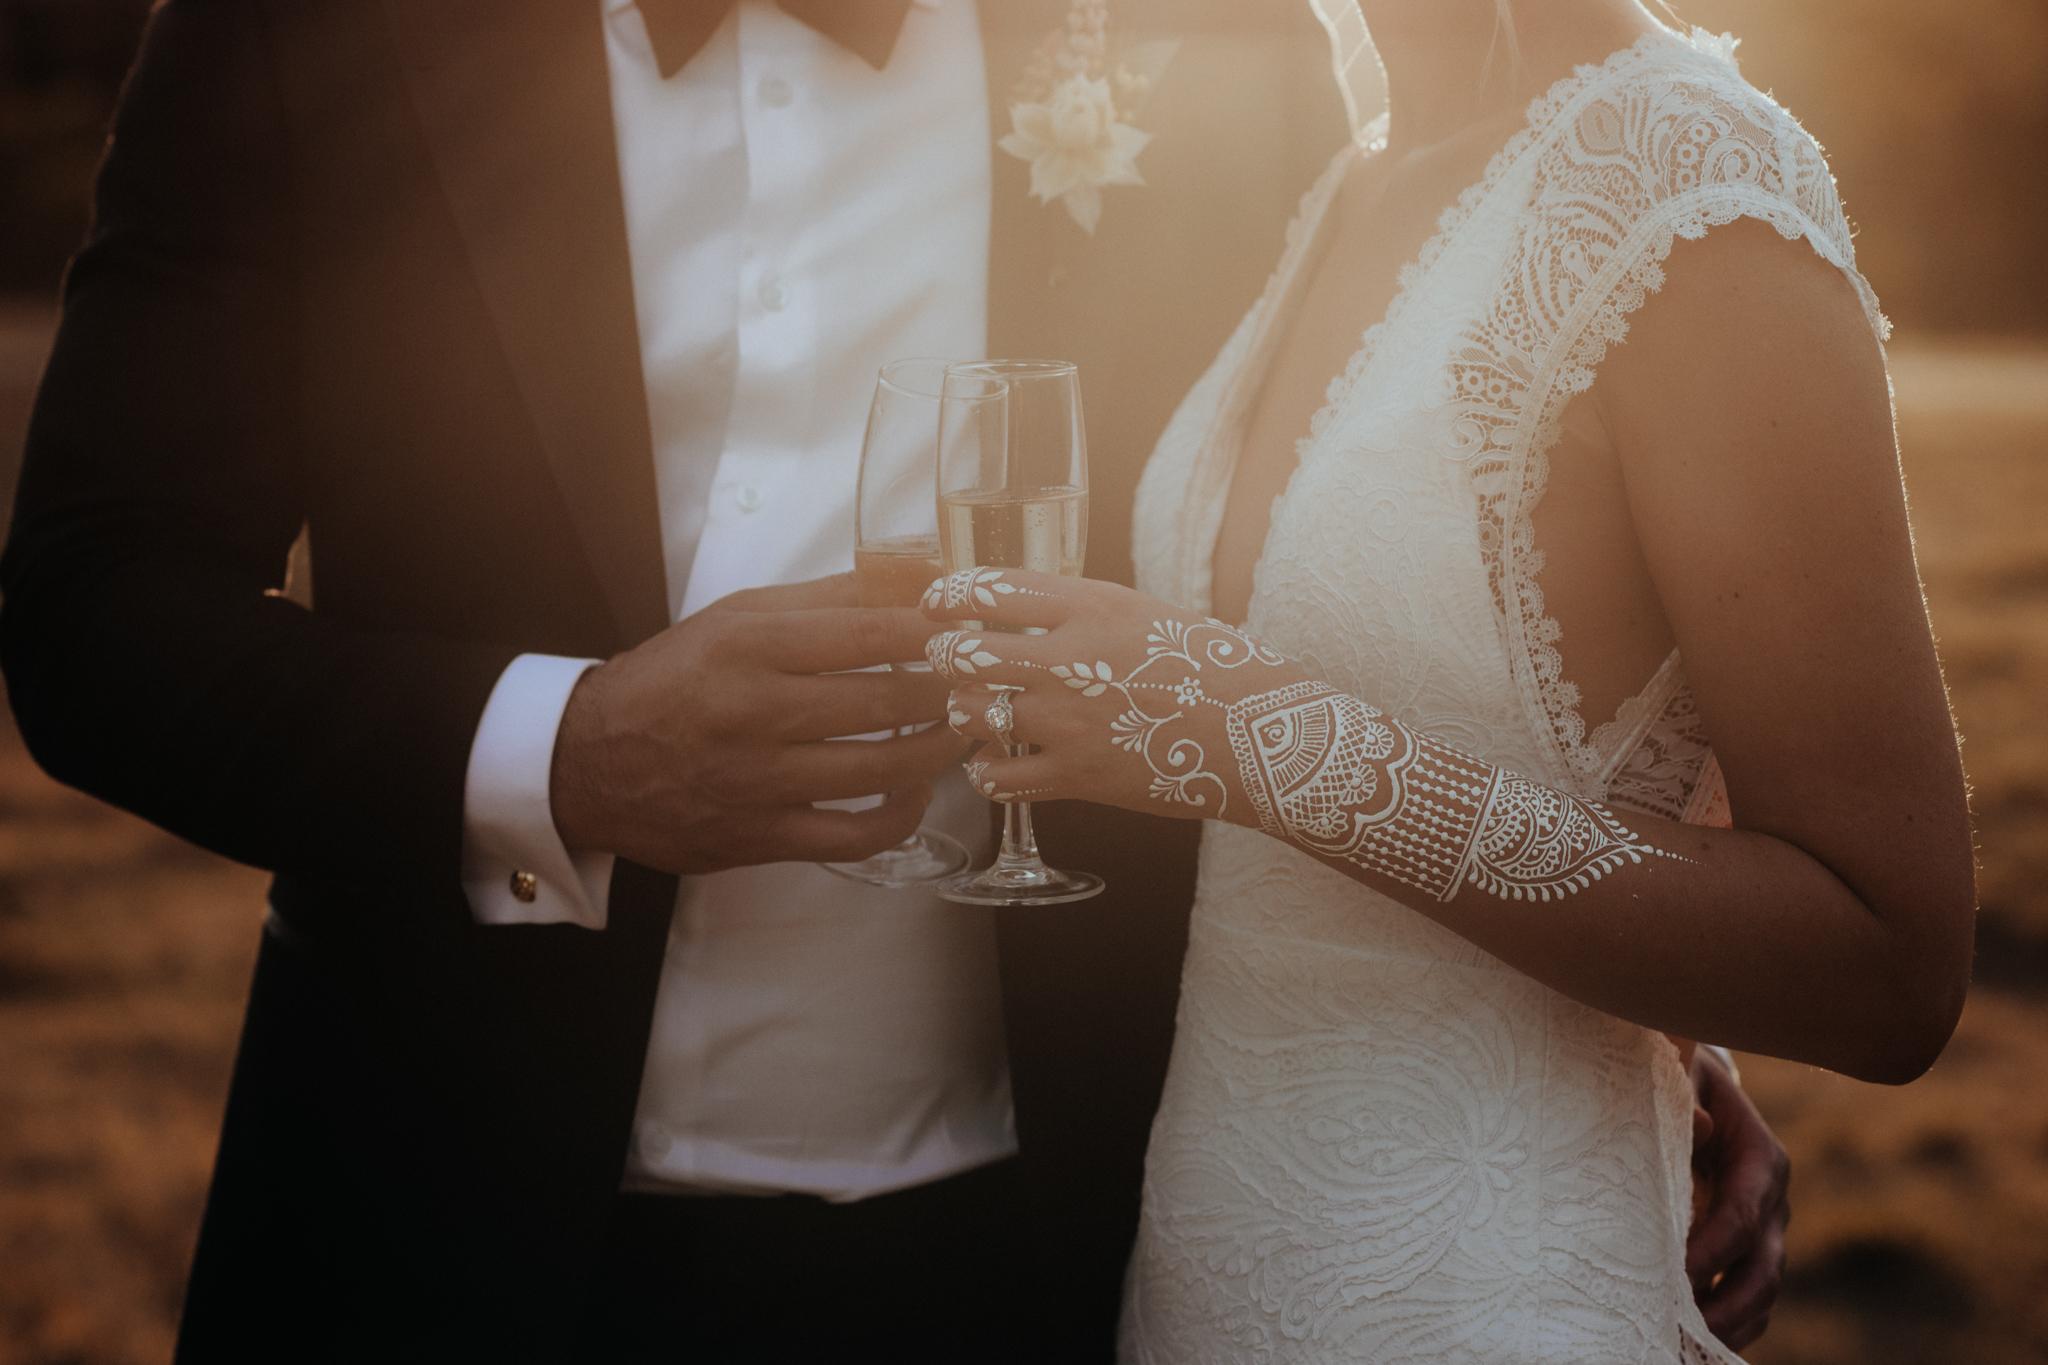 BRISBANE WEDDING PHOTOGRAPHER • BUNDALEER RAINFOREST GARDENS WEDDING • ONE DAY BRIDAL WEDDING GOWN • ROXY HOTTEN CELEBRANT • LOVELENSCAPES PHOTOGRAPHY • 129.jpg